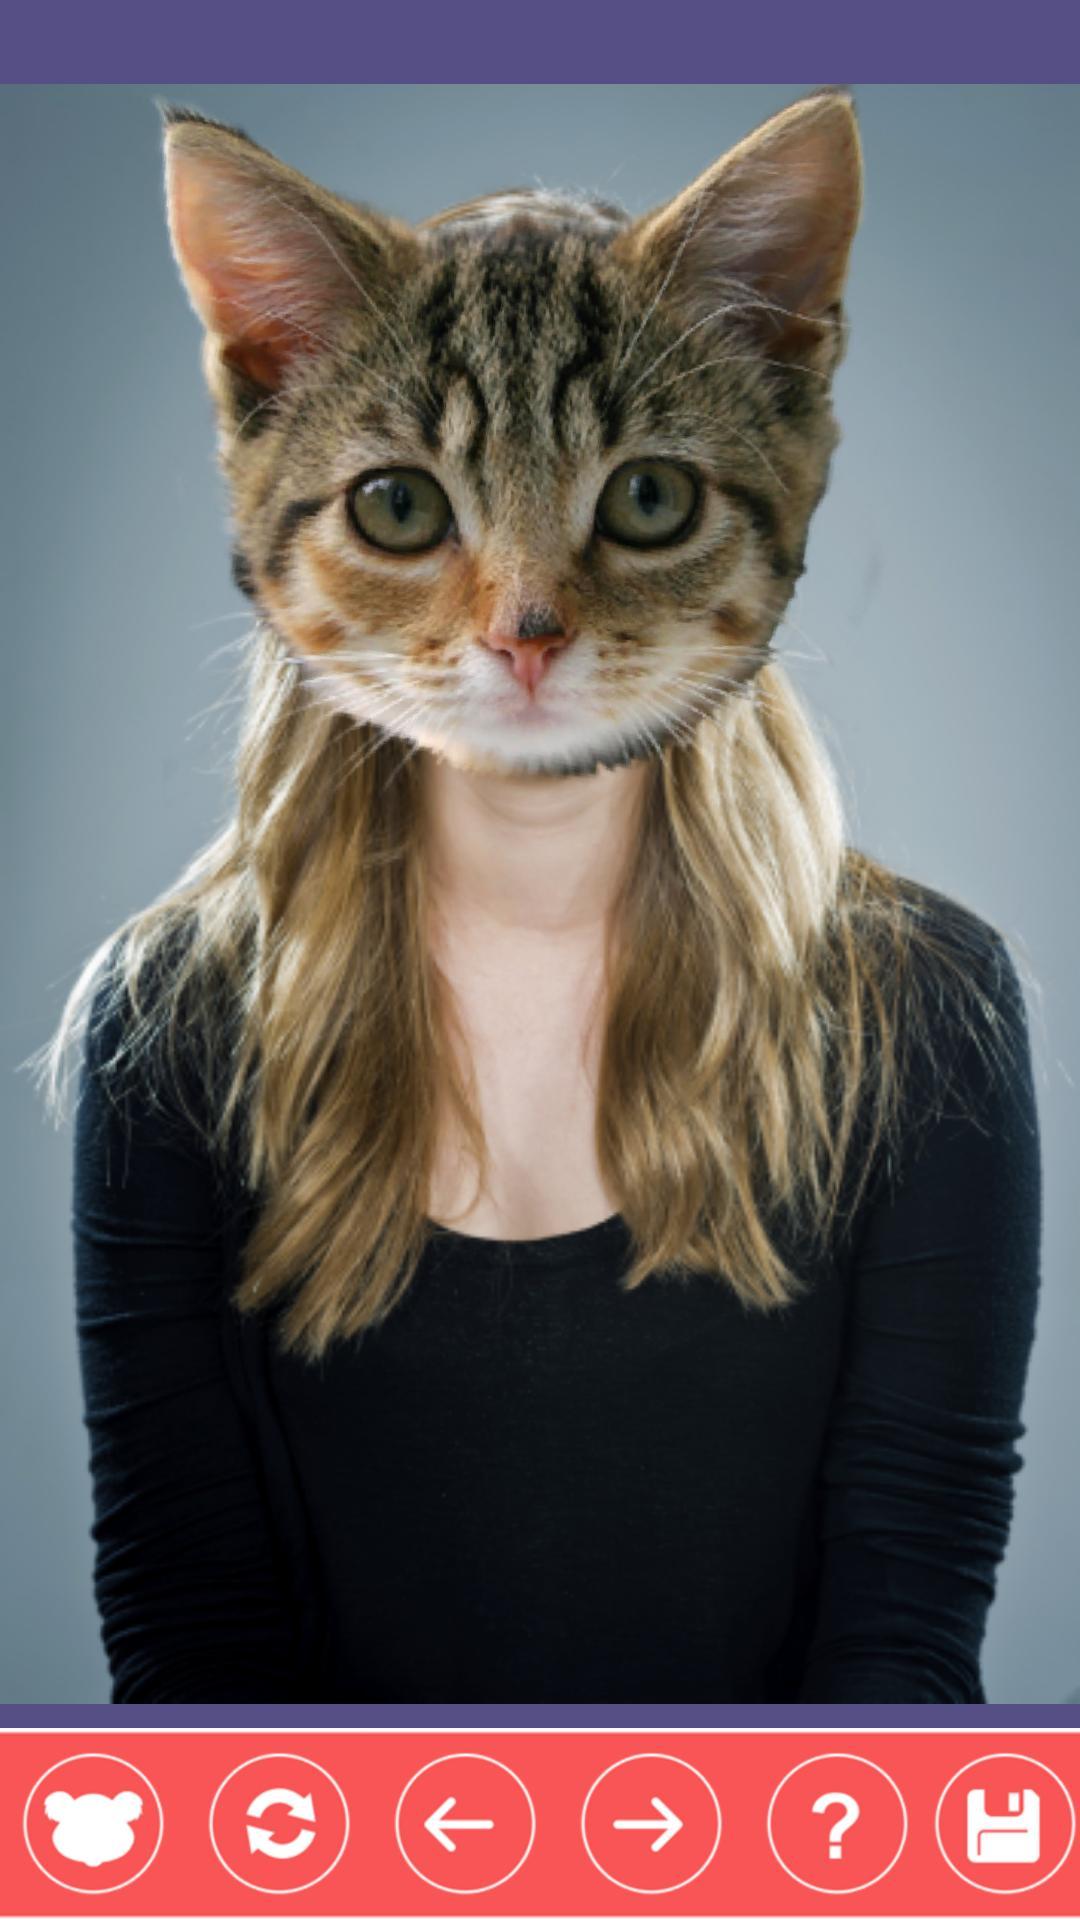 Animal Face Photo screenshot 3